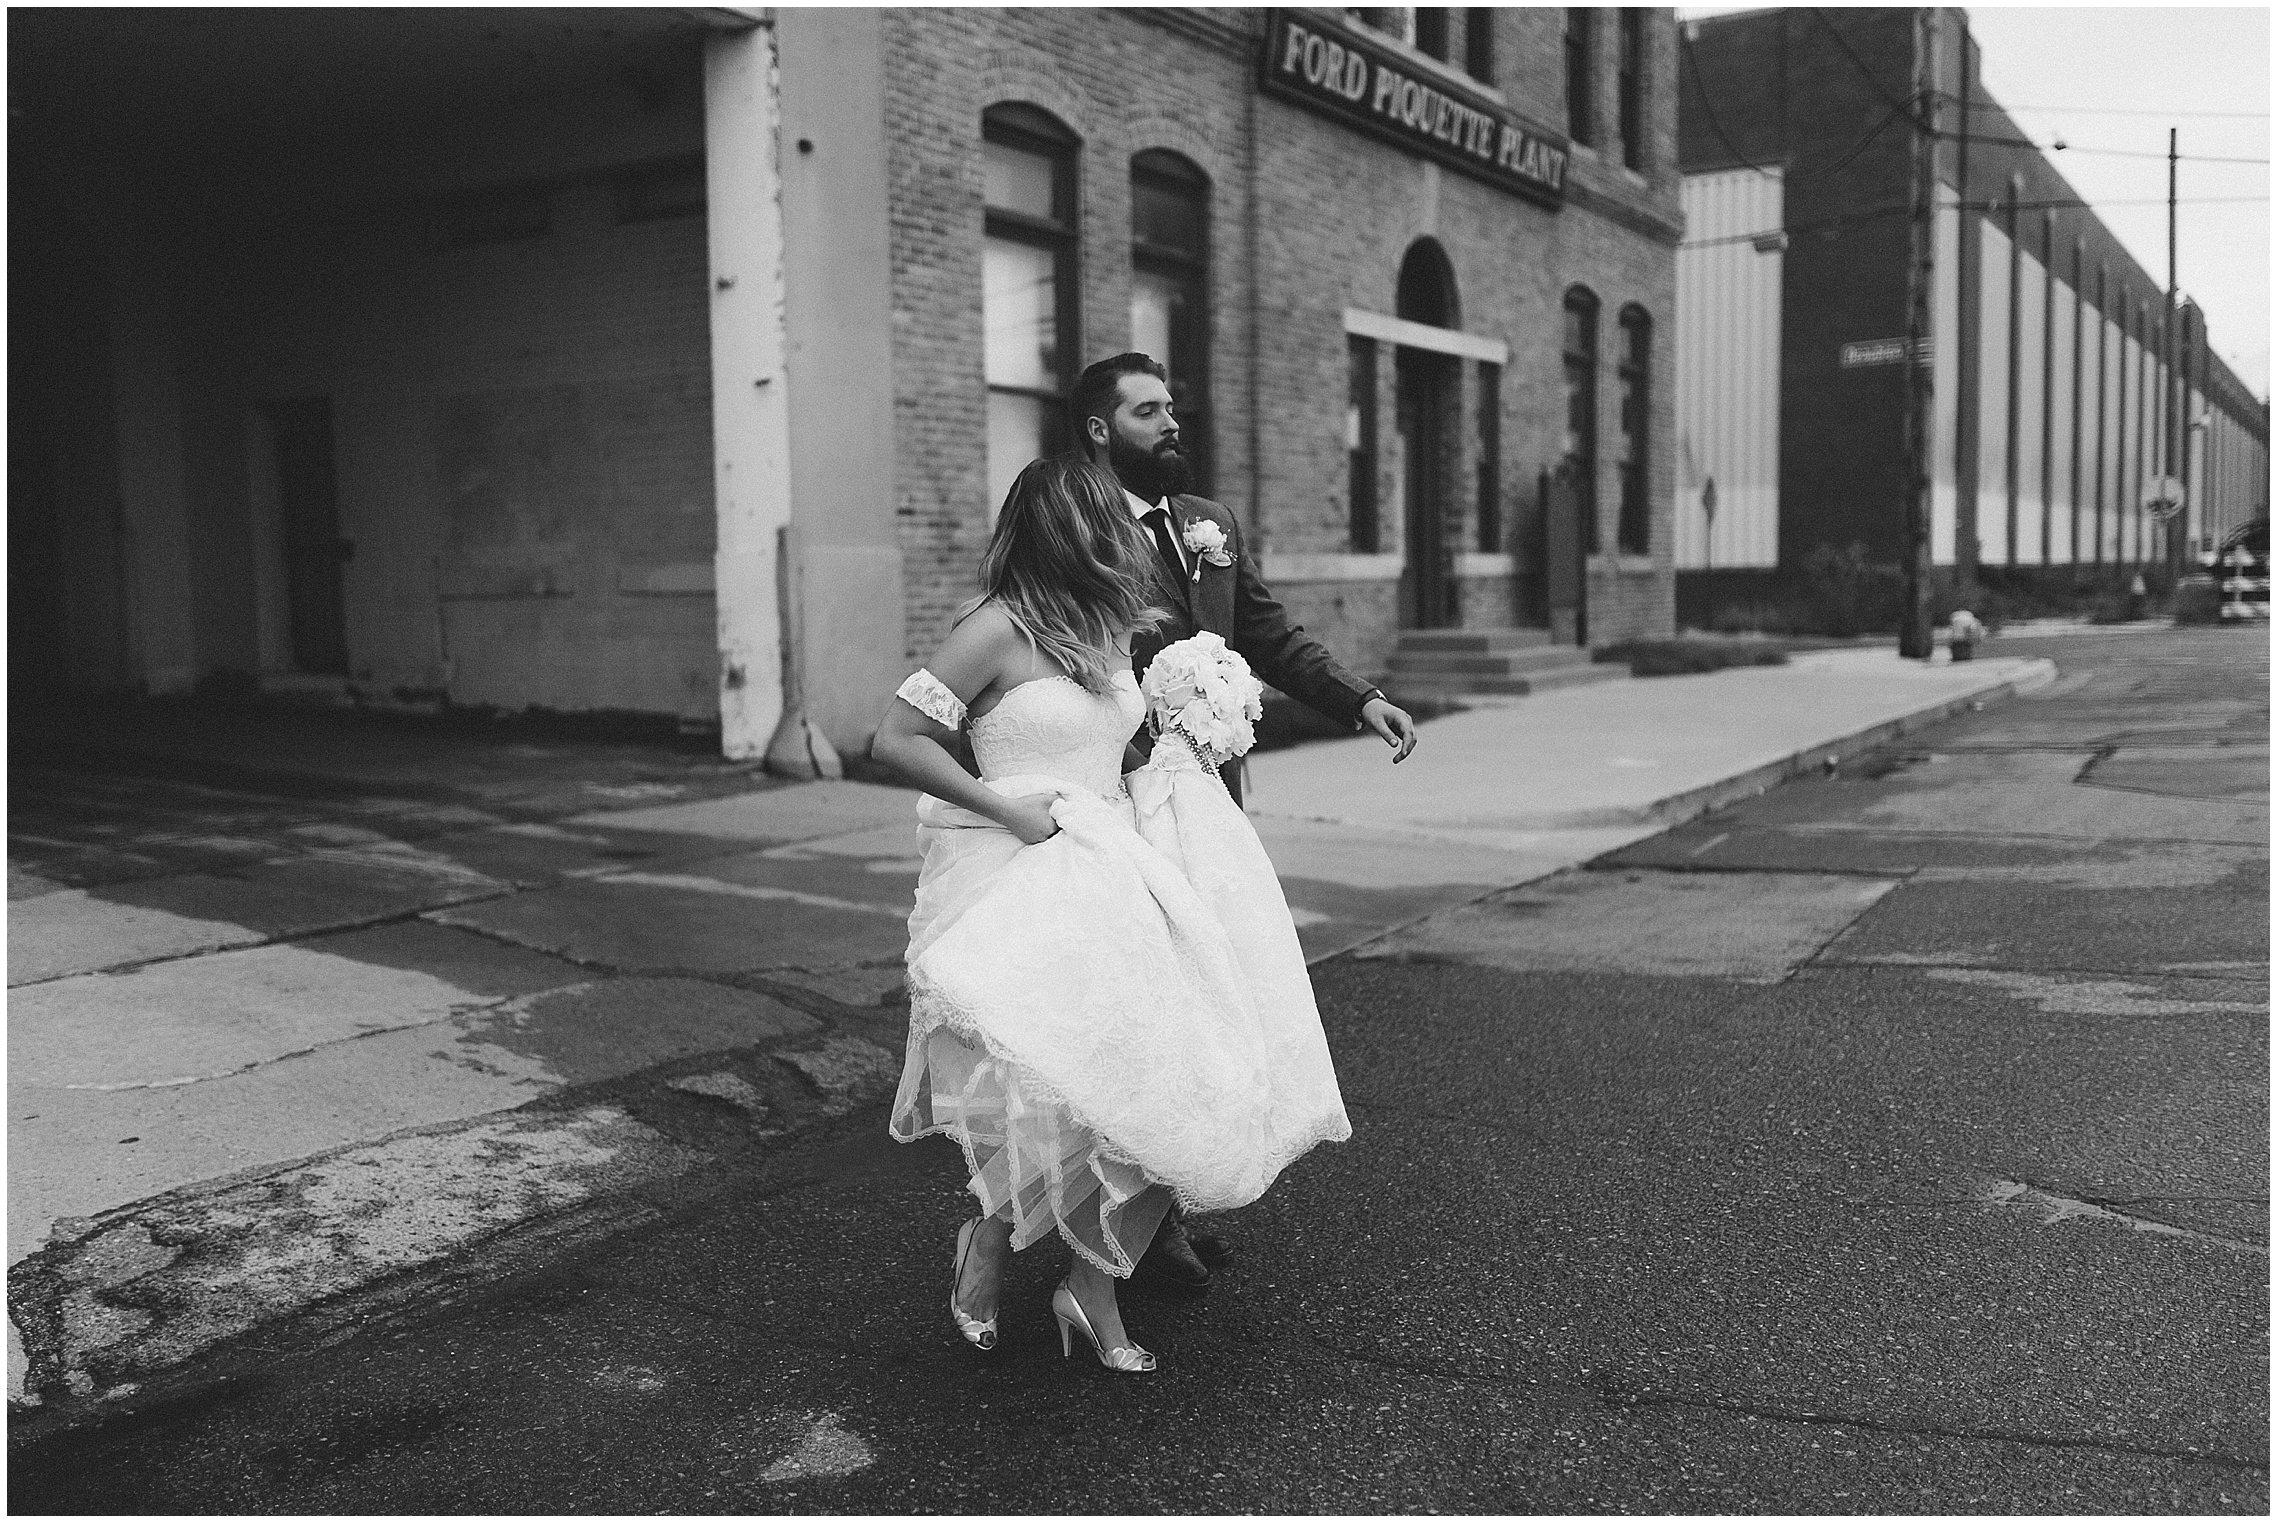 brick_and_mortar_colorado_wedding_photographer_0270.jpg